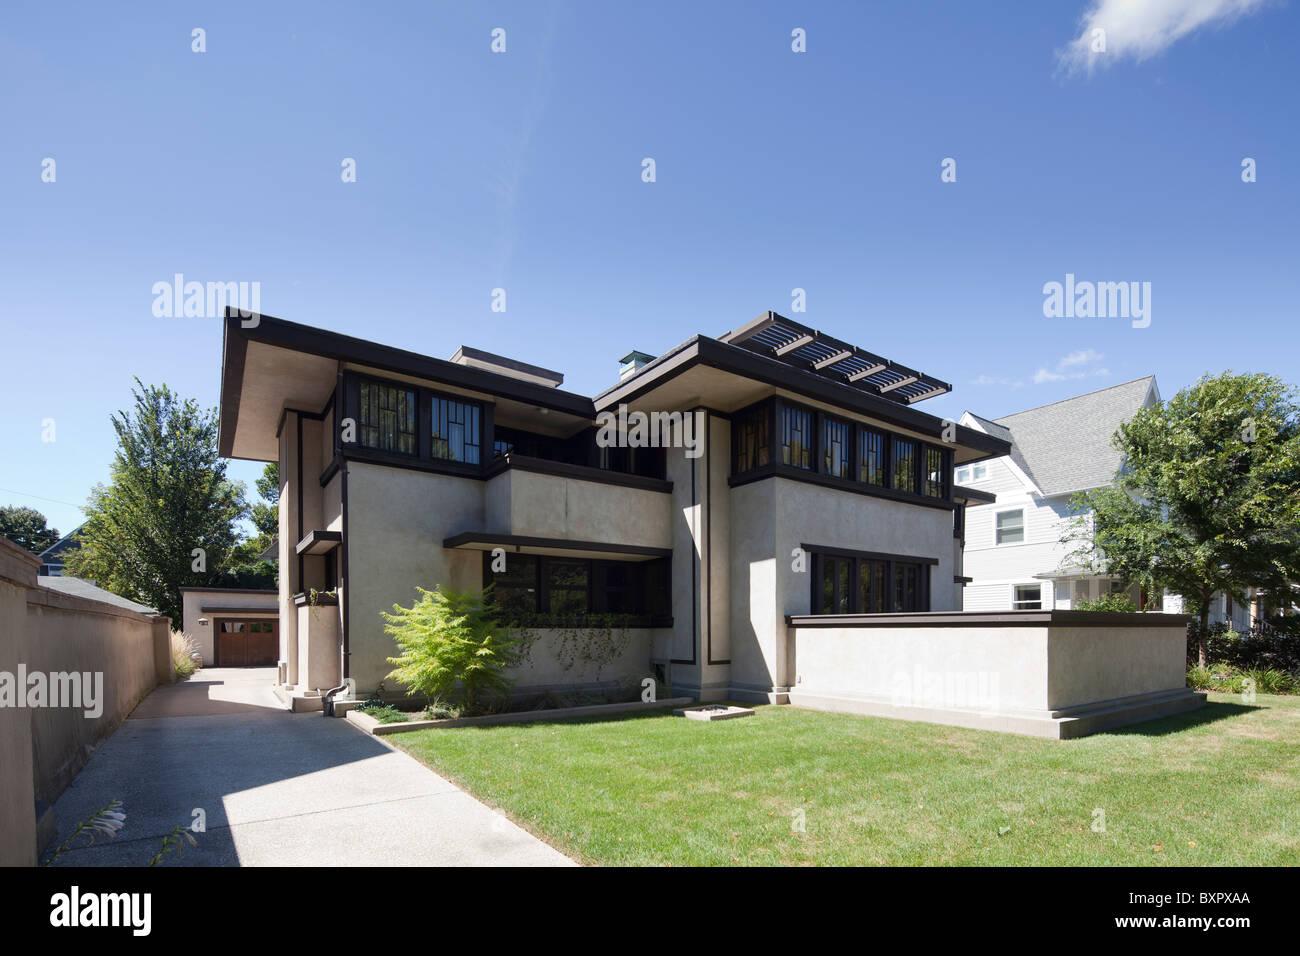 Oscar B. Balch casa por Frank Lloyd Wright, Oak Park, Chicago, Illinois, EE.UU. Imagen De Stock